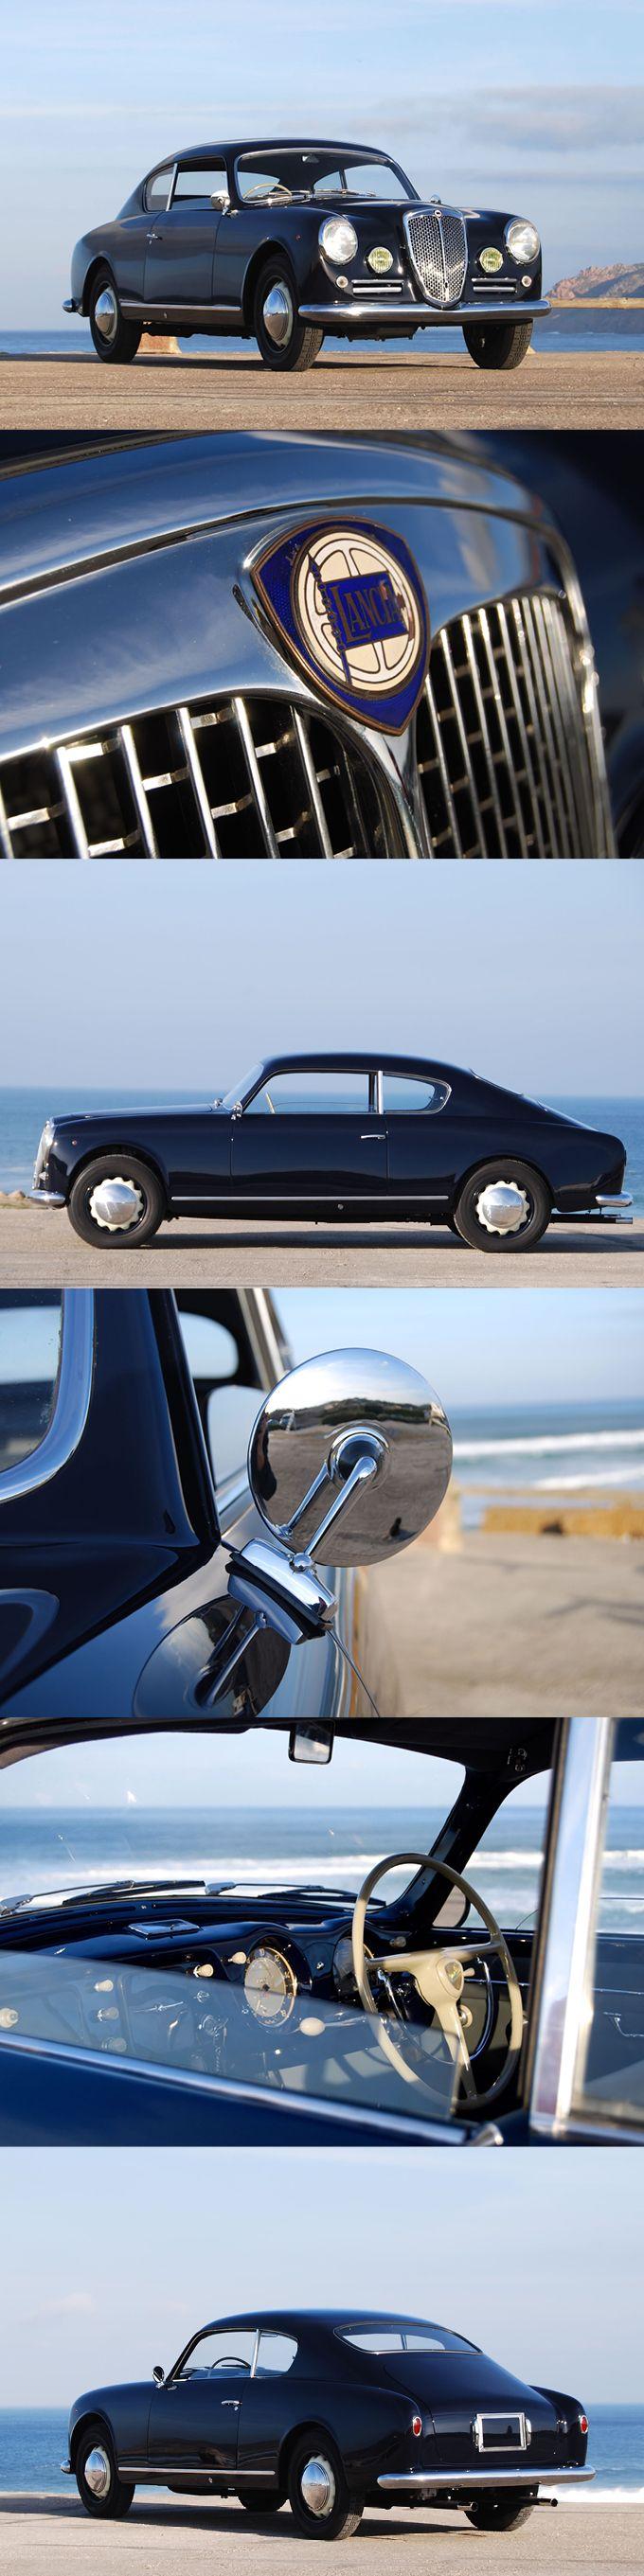 1952 Lancia Aurelia GT / B20 / 80hp 2.0l V6 / Ghia / black / Italy / 17--337